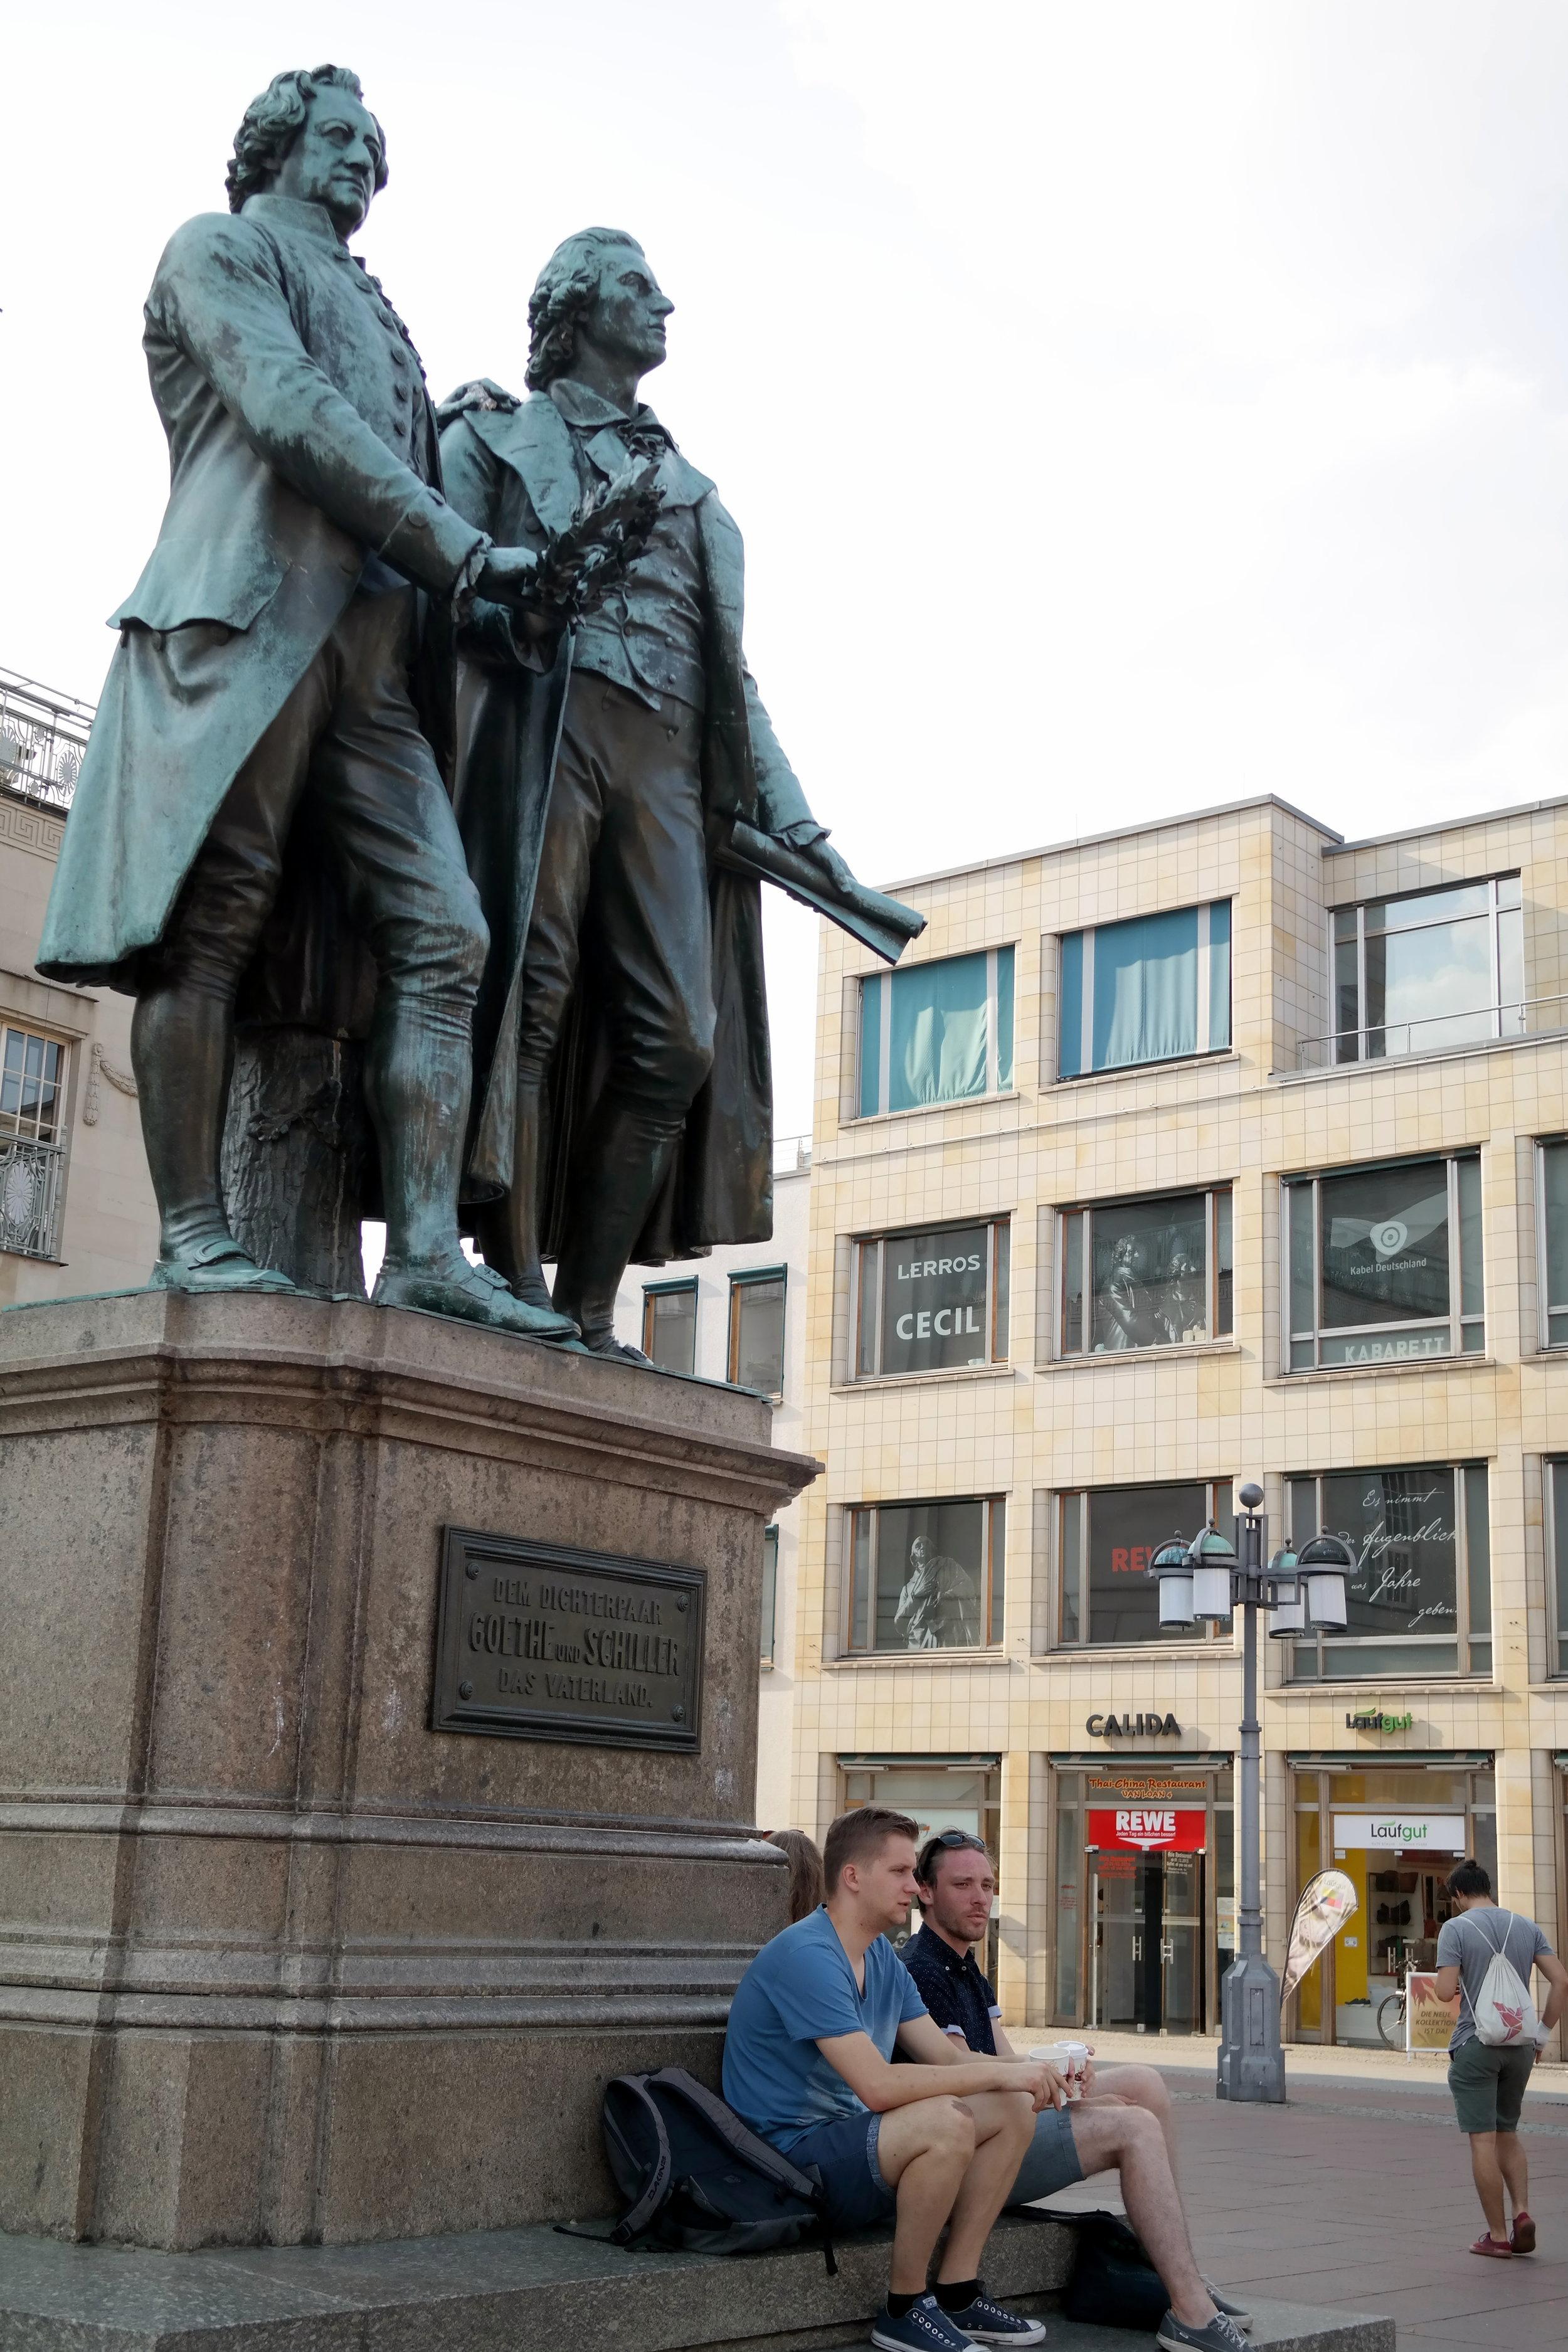 Goethe och Schiller på Theaterplatz